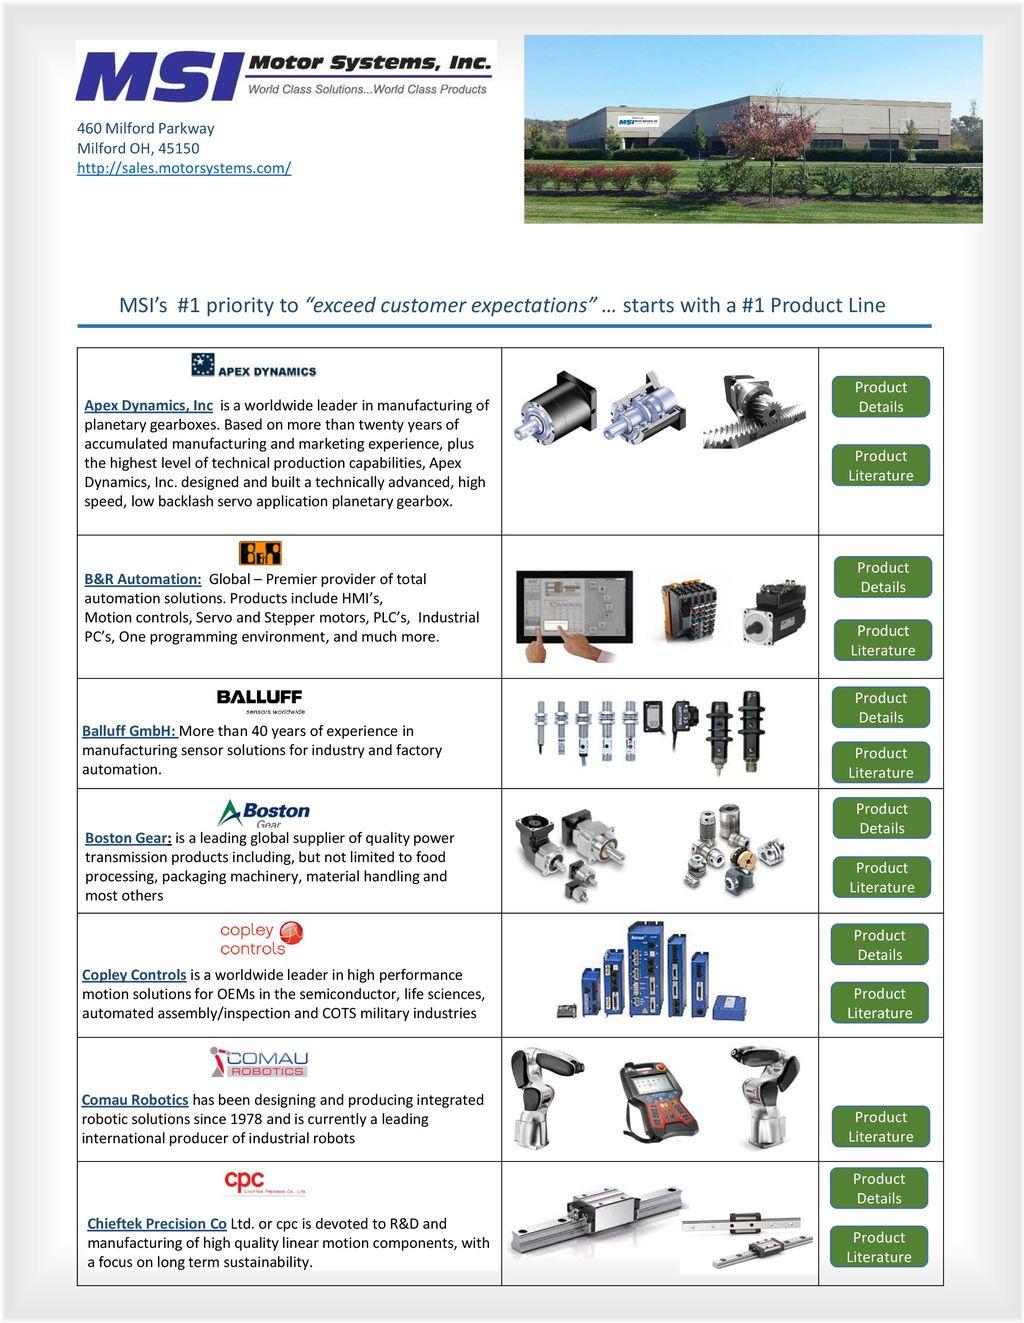 Msi Solutions Motion Control Stepper Motors Product Details Ppt Parker Electromechanical Automation Faq Site Servo 2 460